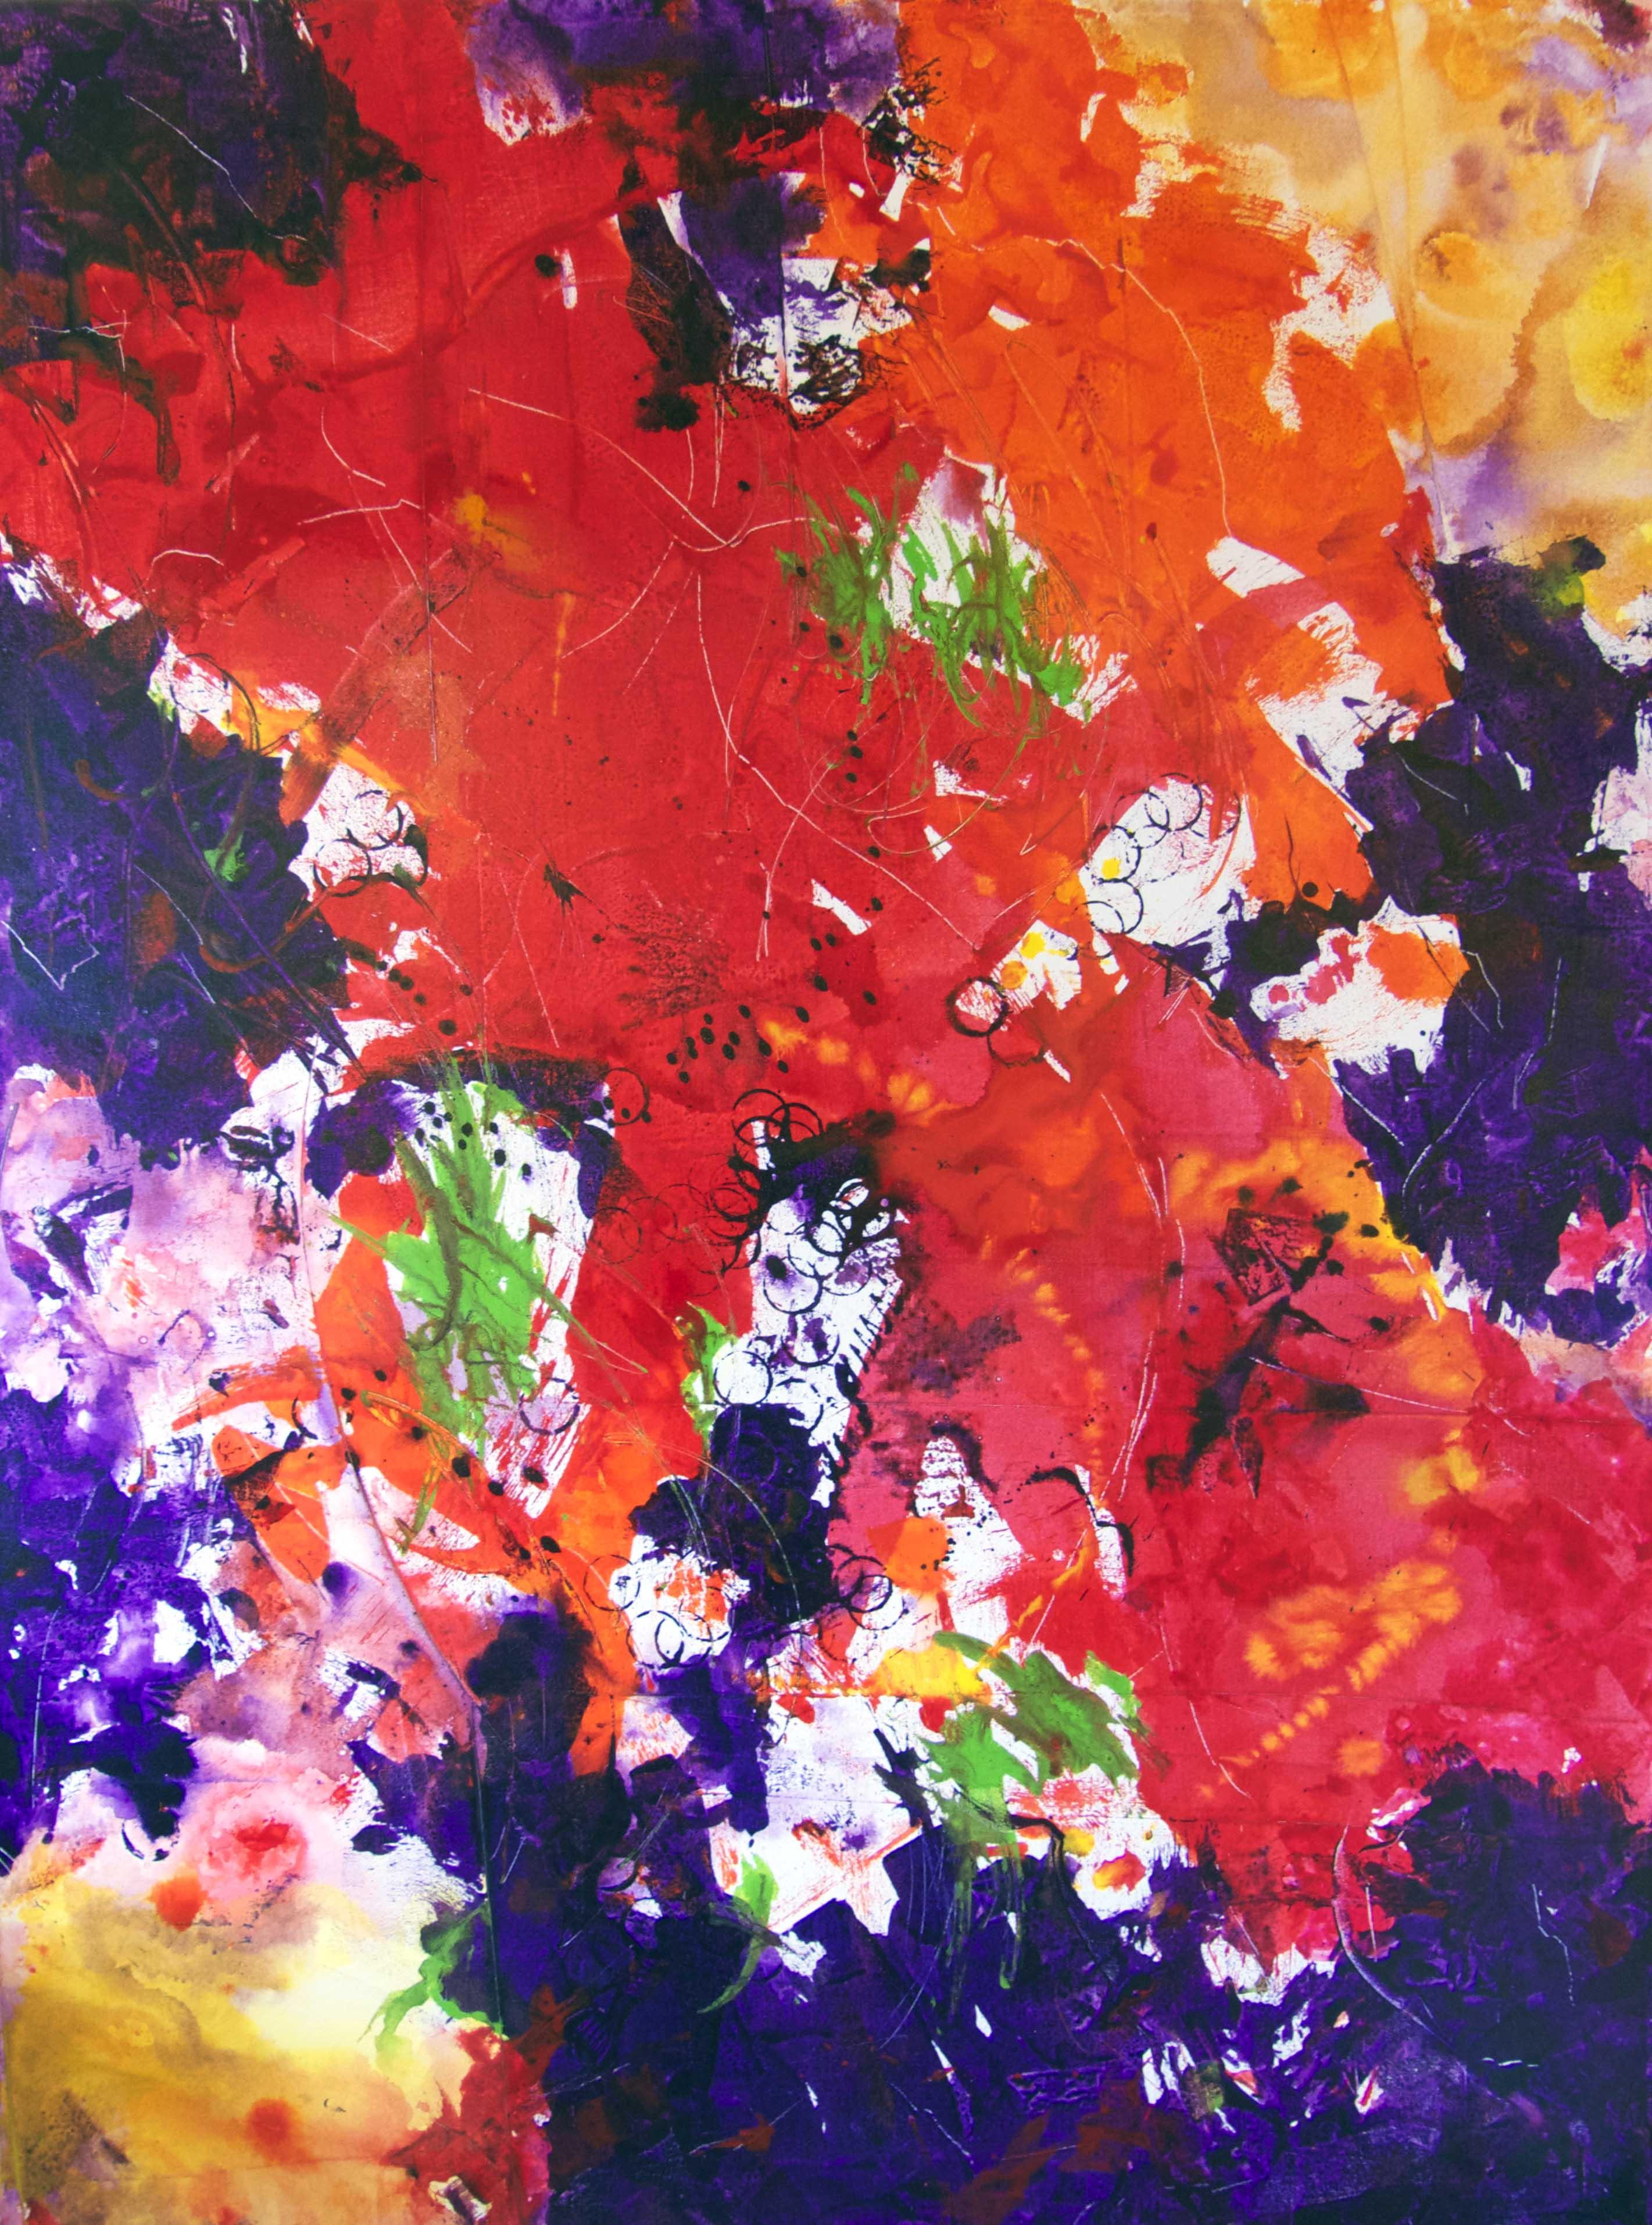 Watercolor art society houston tx - Watercolor Art Society Houston Tx 48